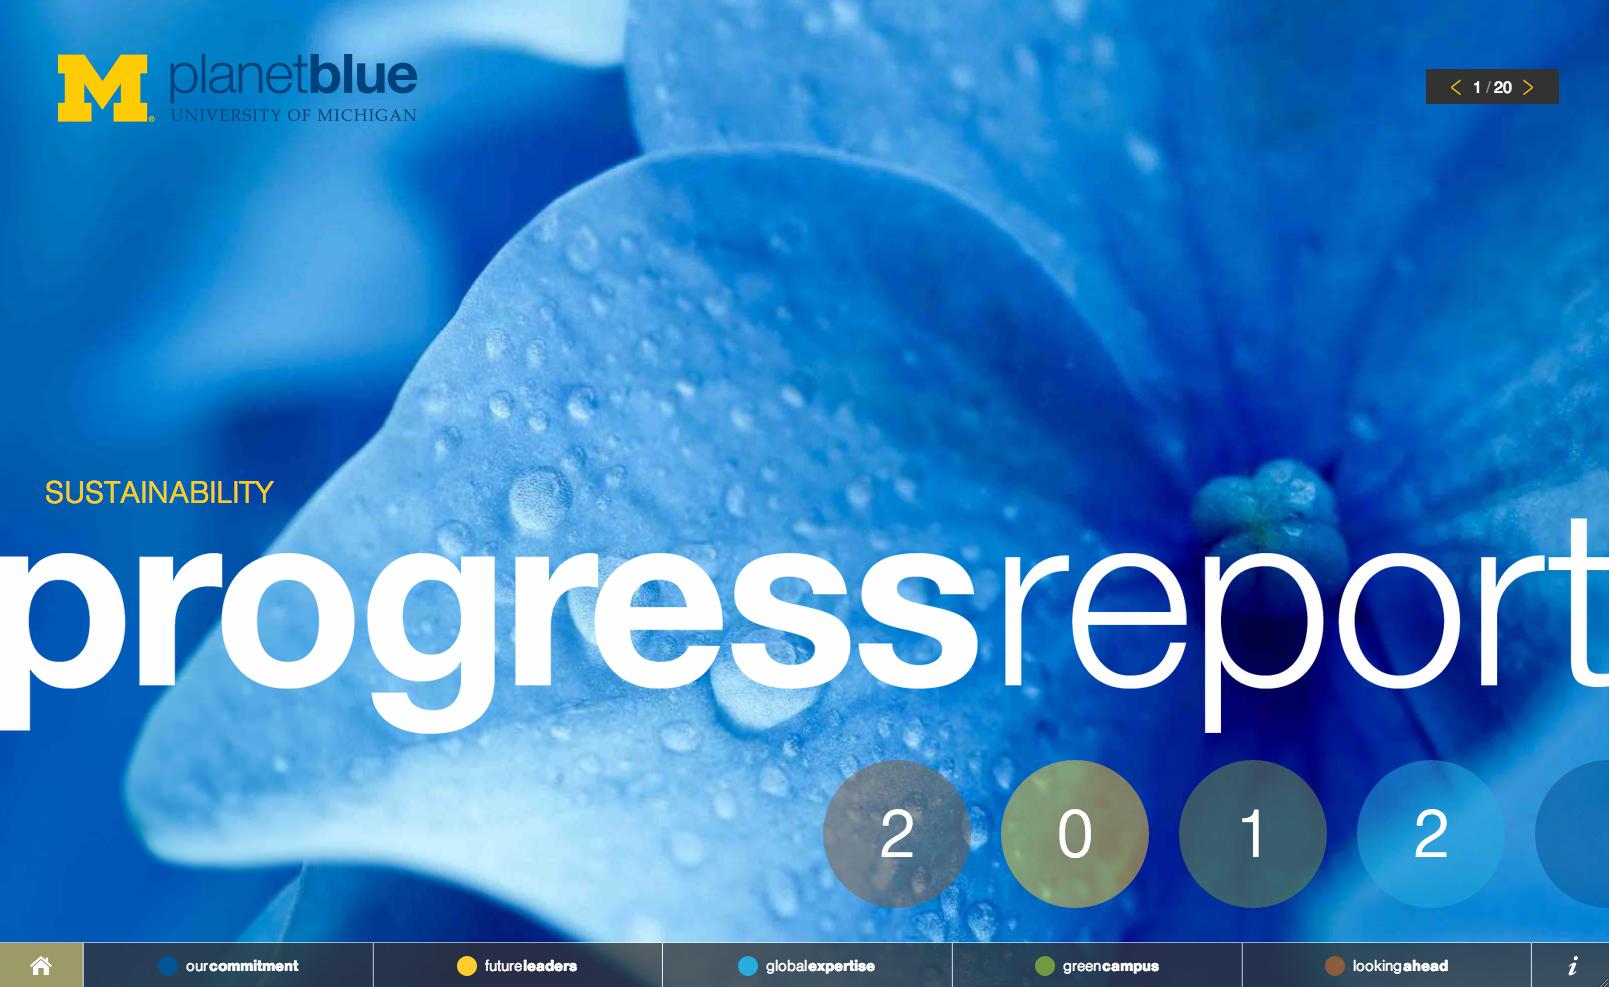 University of Michigan Planet Blue Sustainability Progress Report 2012 website